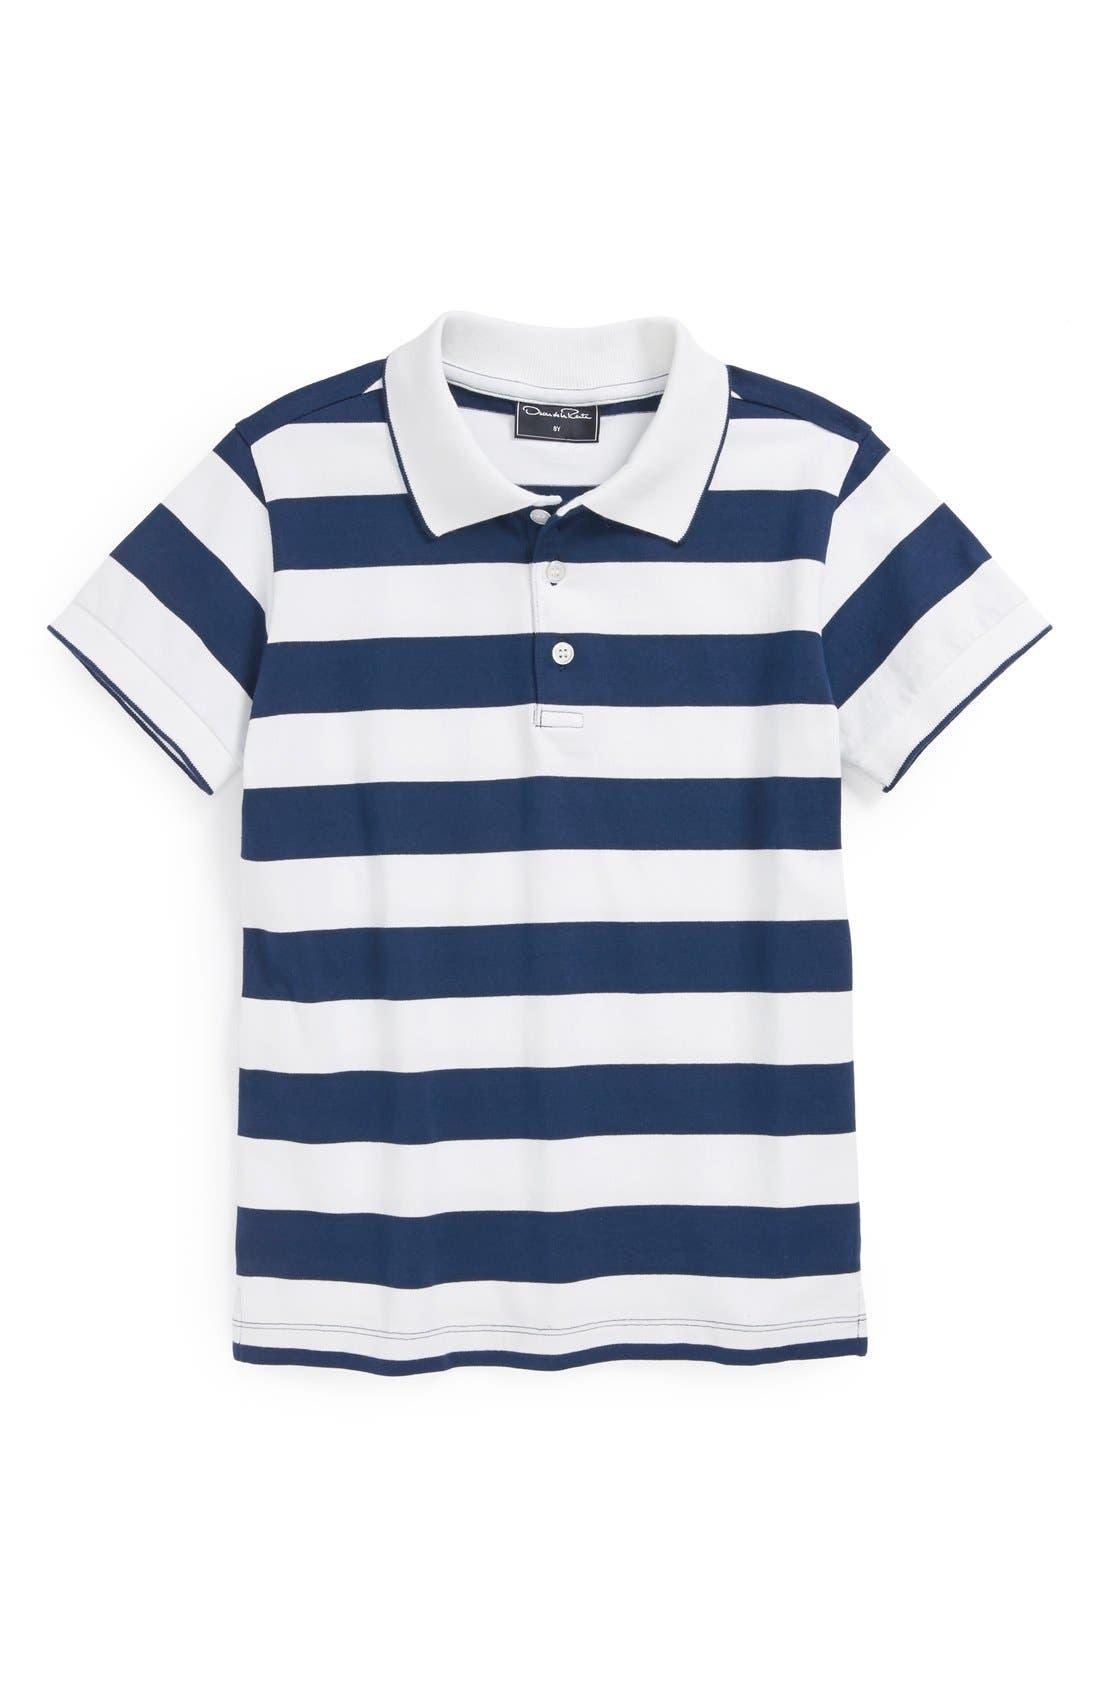 Alternate Image 1 Selected - Oscar de la Renta Wide Stripe Polo (Toddler Boys, Little Boys & Big Boys)